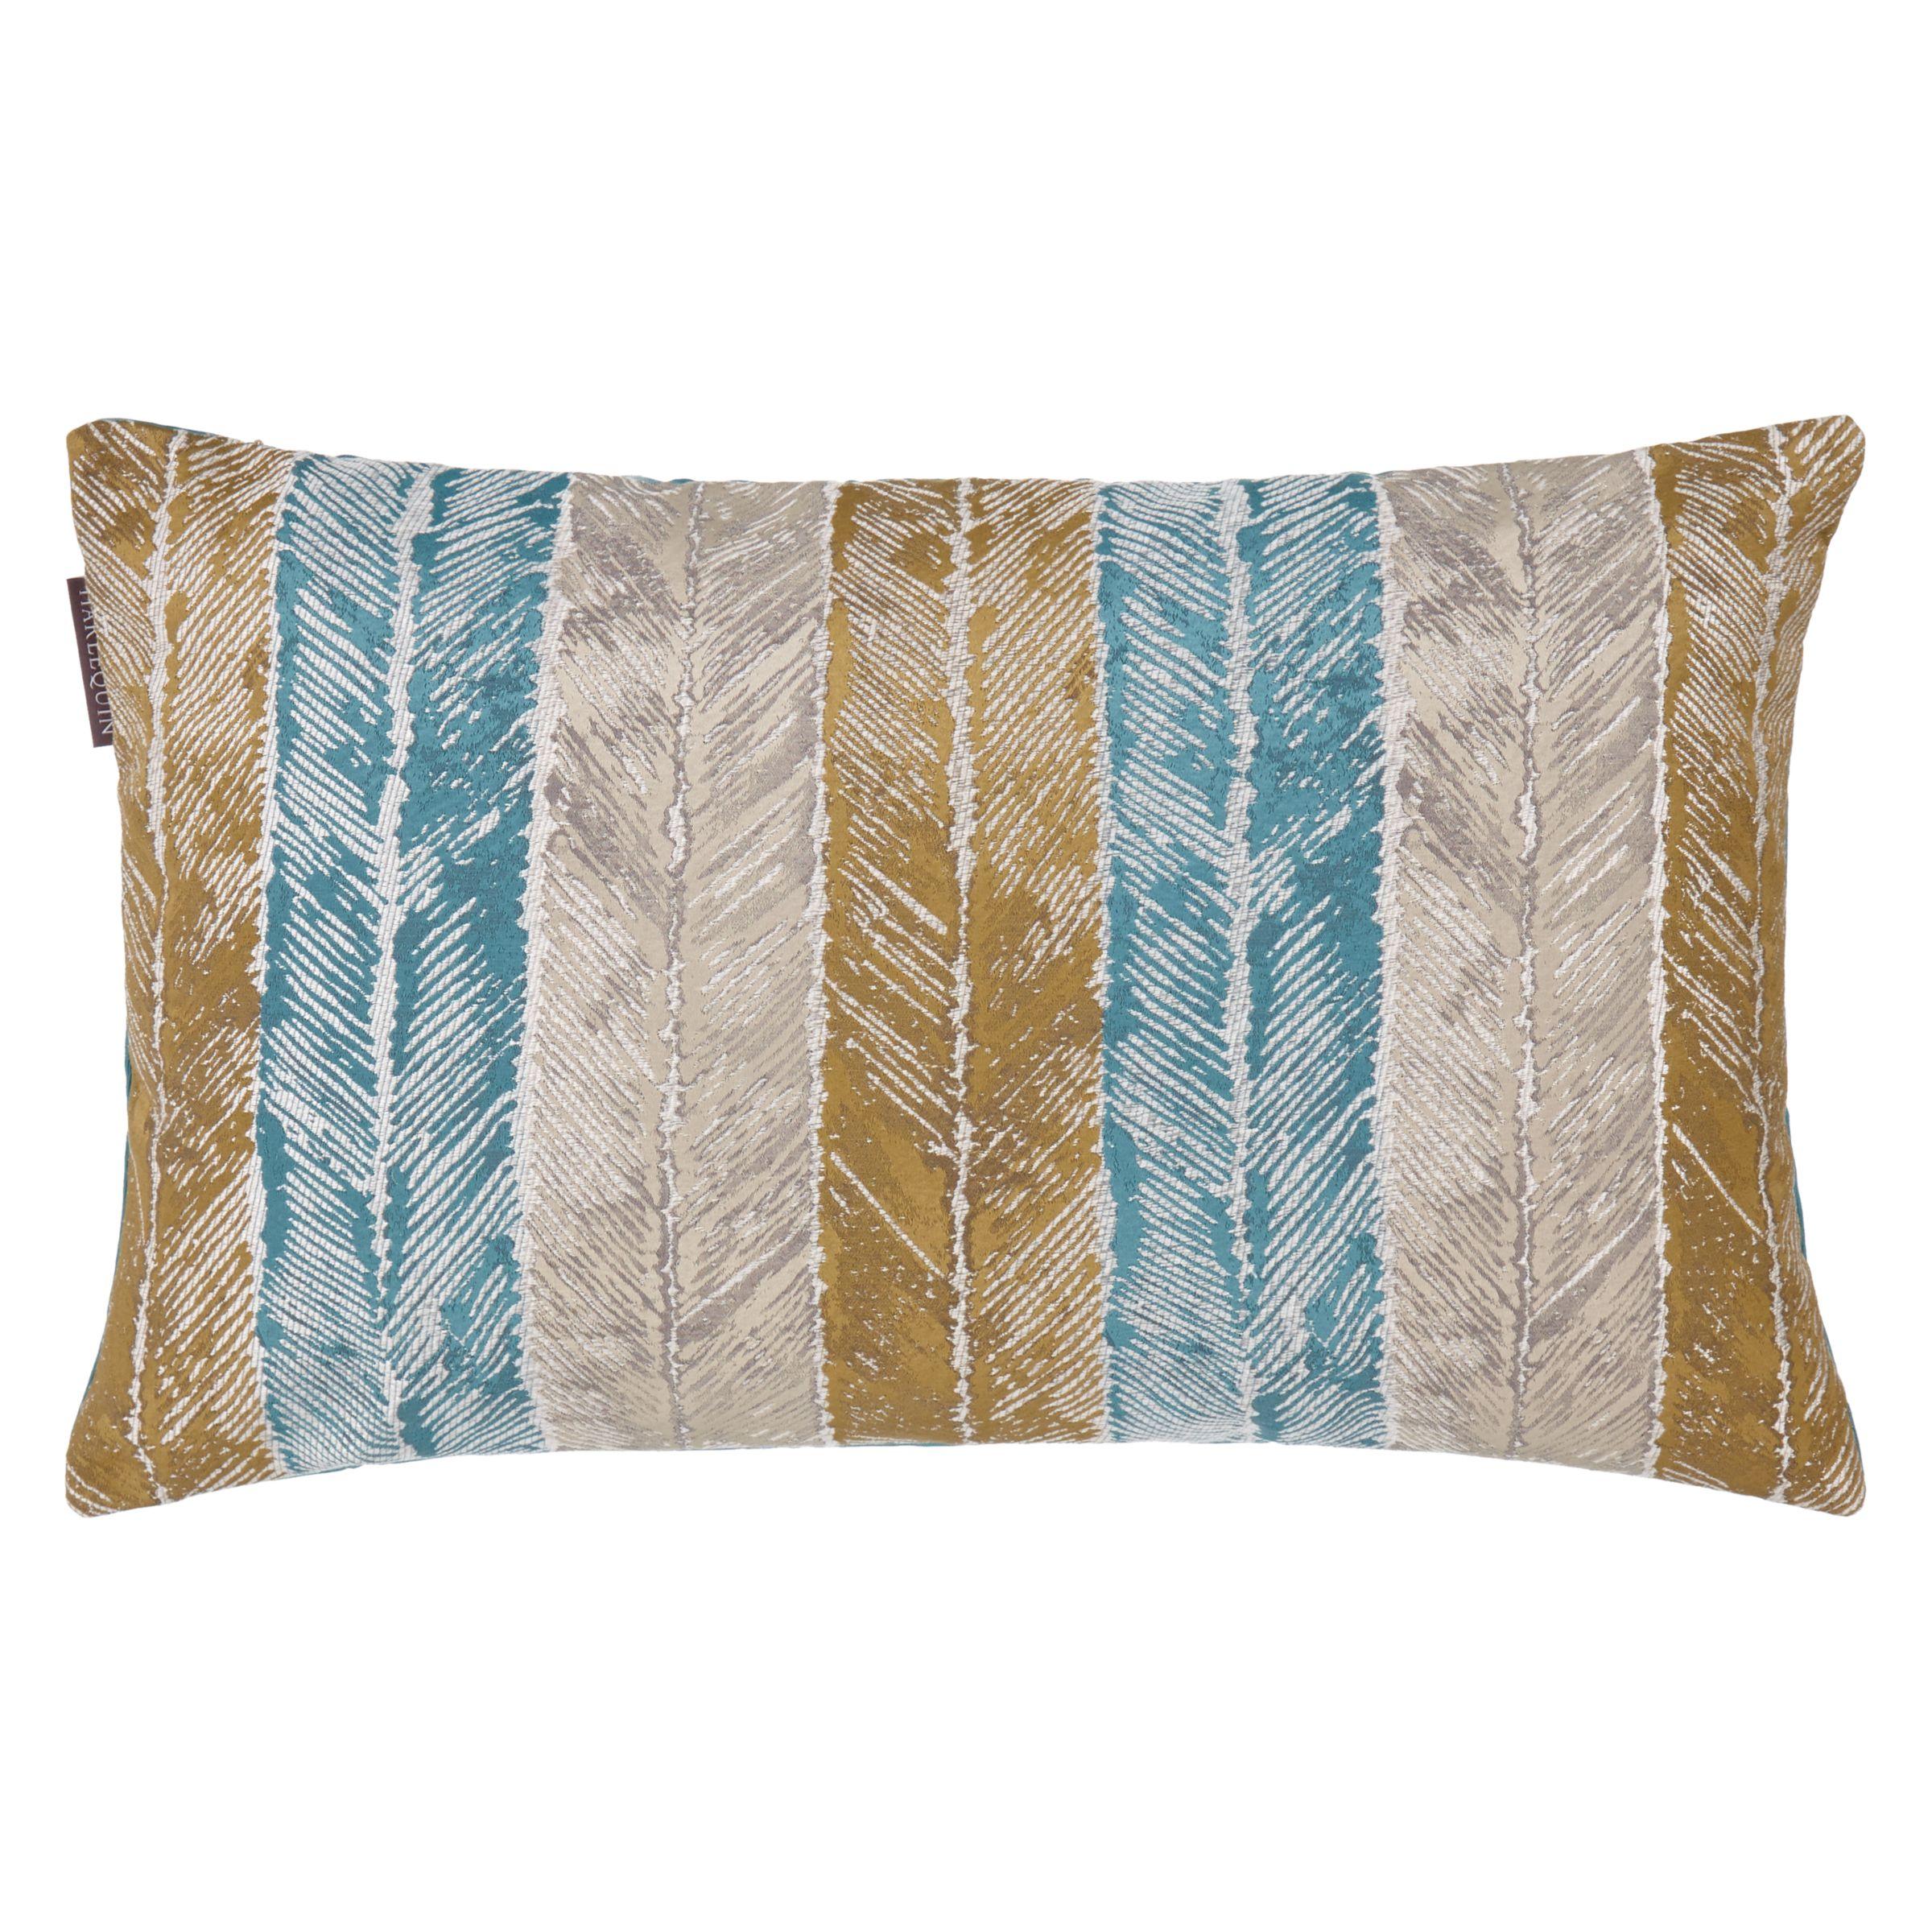 Harlequin Harlequin Walchia Mottle Cushion